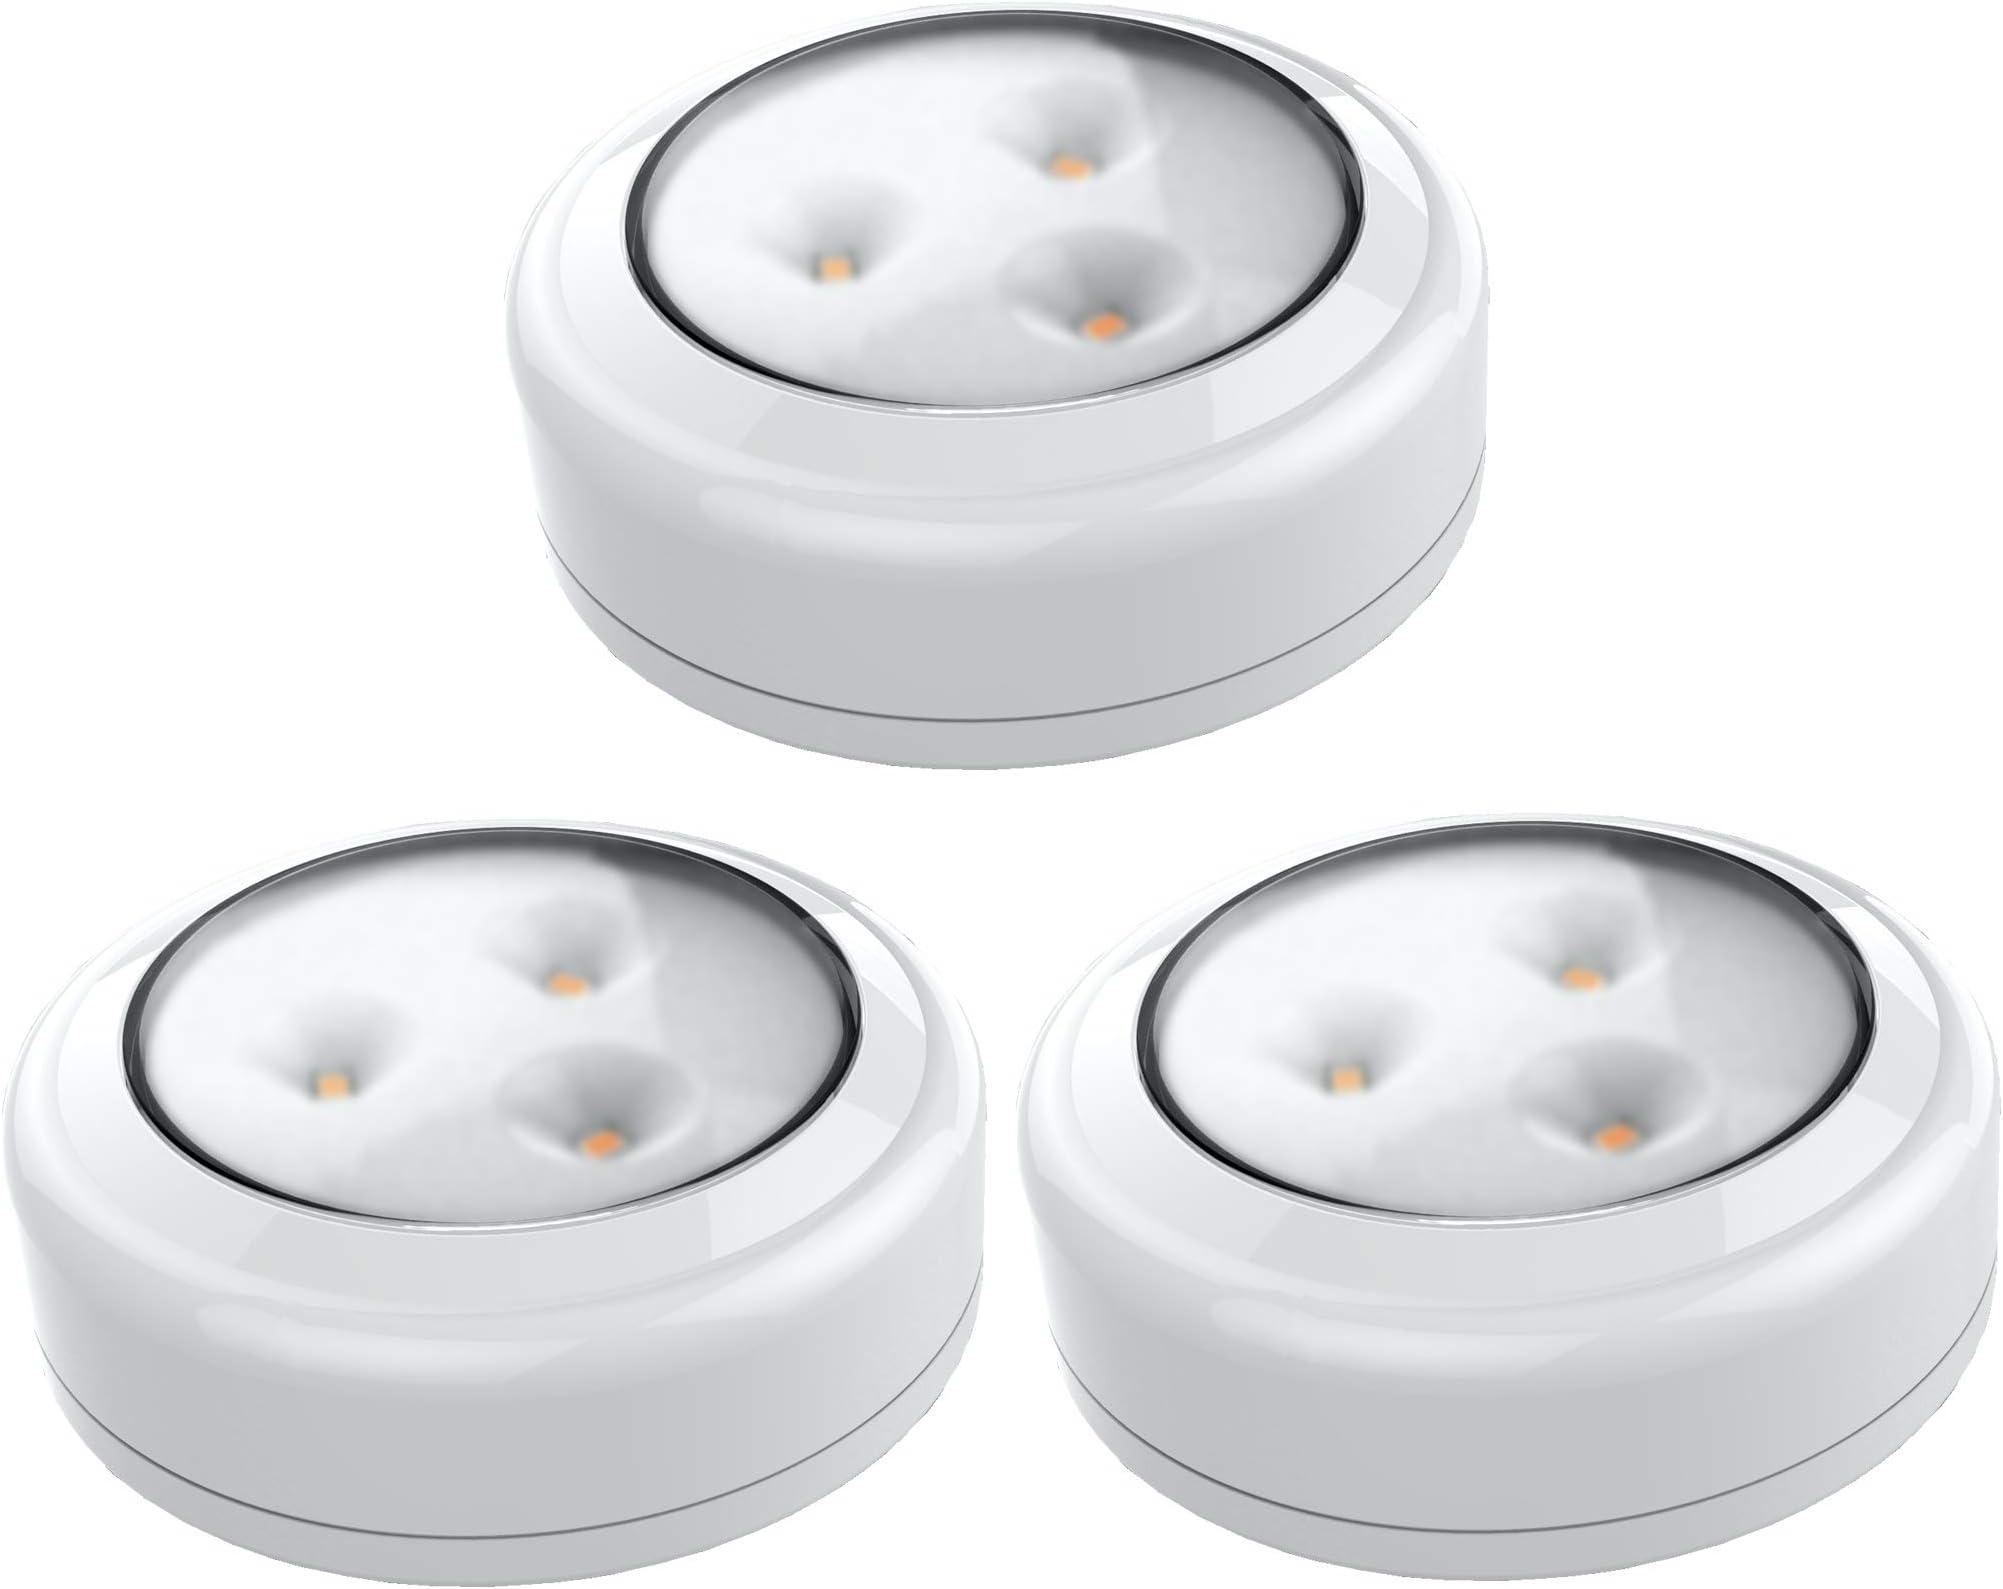 Brilliant Evolution BRRC133 Wireless LED Puck Light 3 Pack | LED Under Cabinet Lighting | Closet Light | Battery Powered Lights | Under Counter Lighting | Stick On Lights